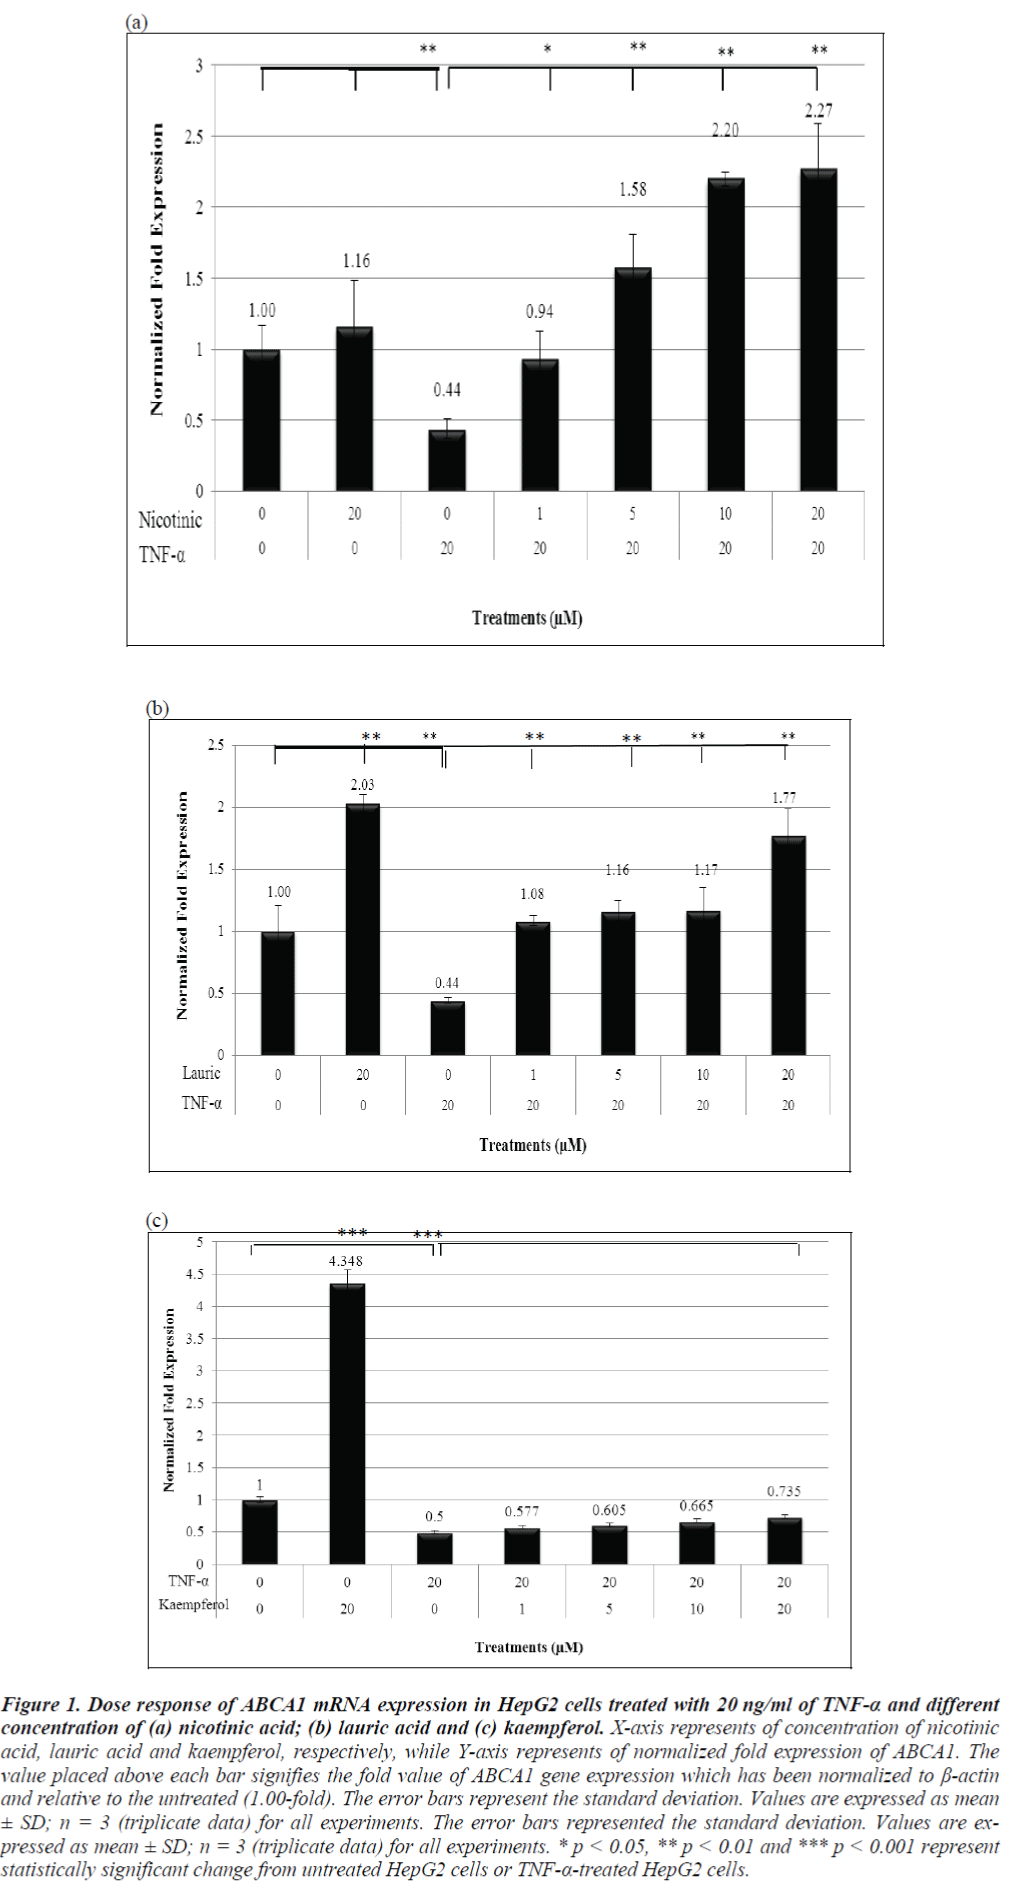 biomedres-Dose-response